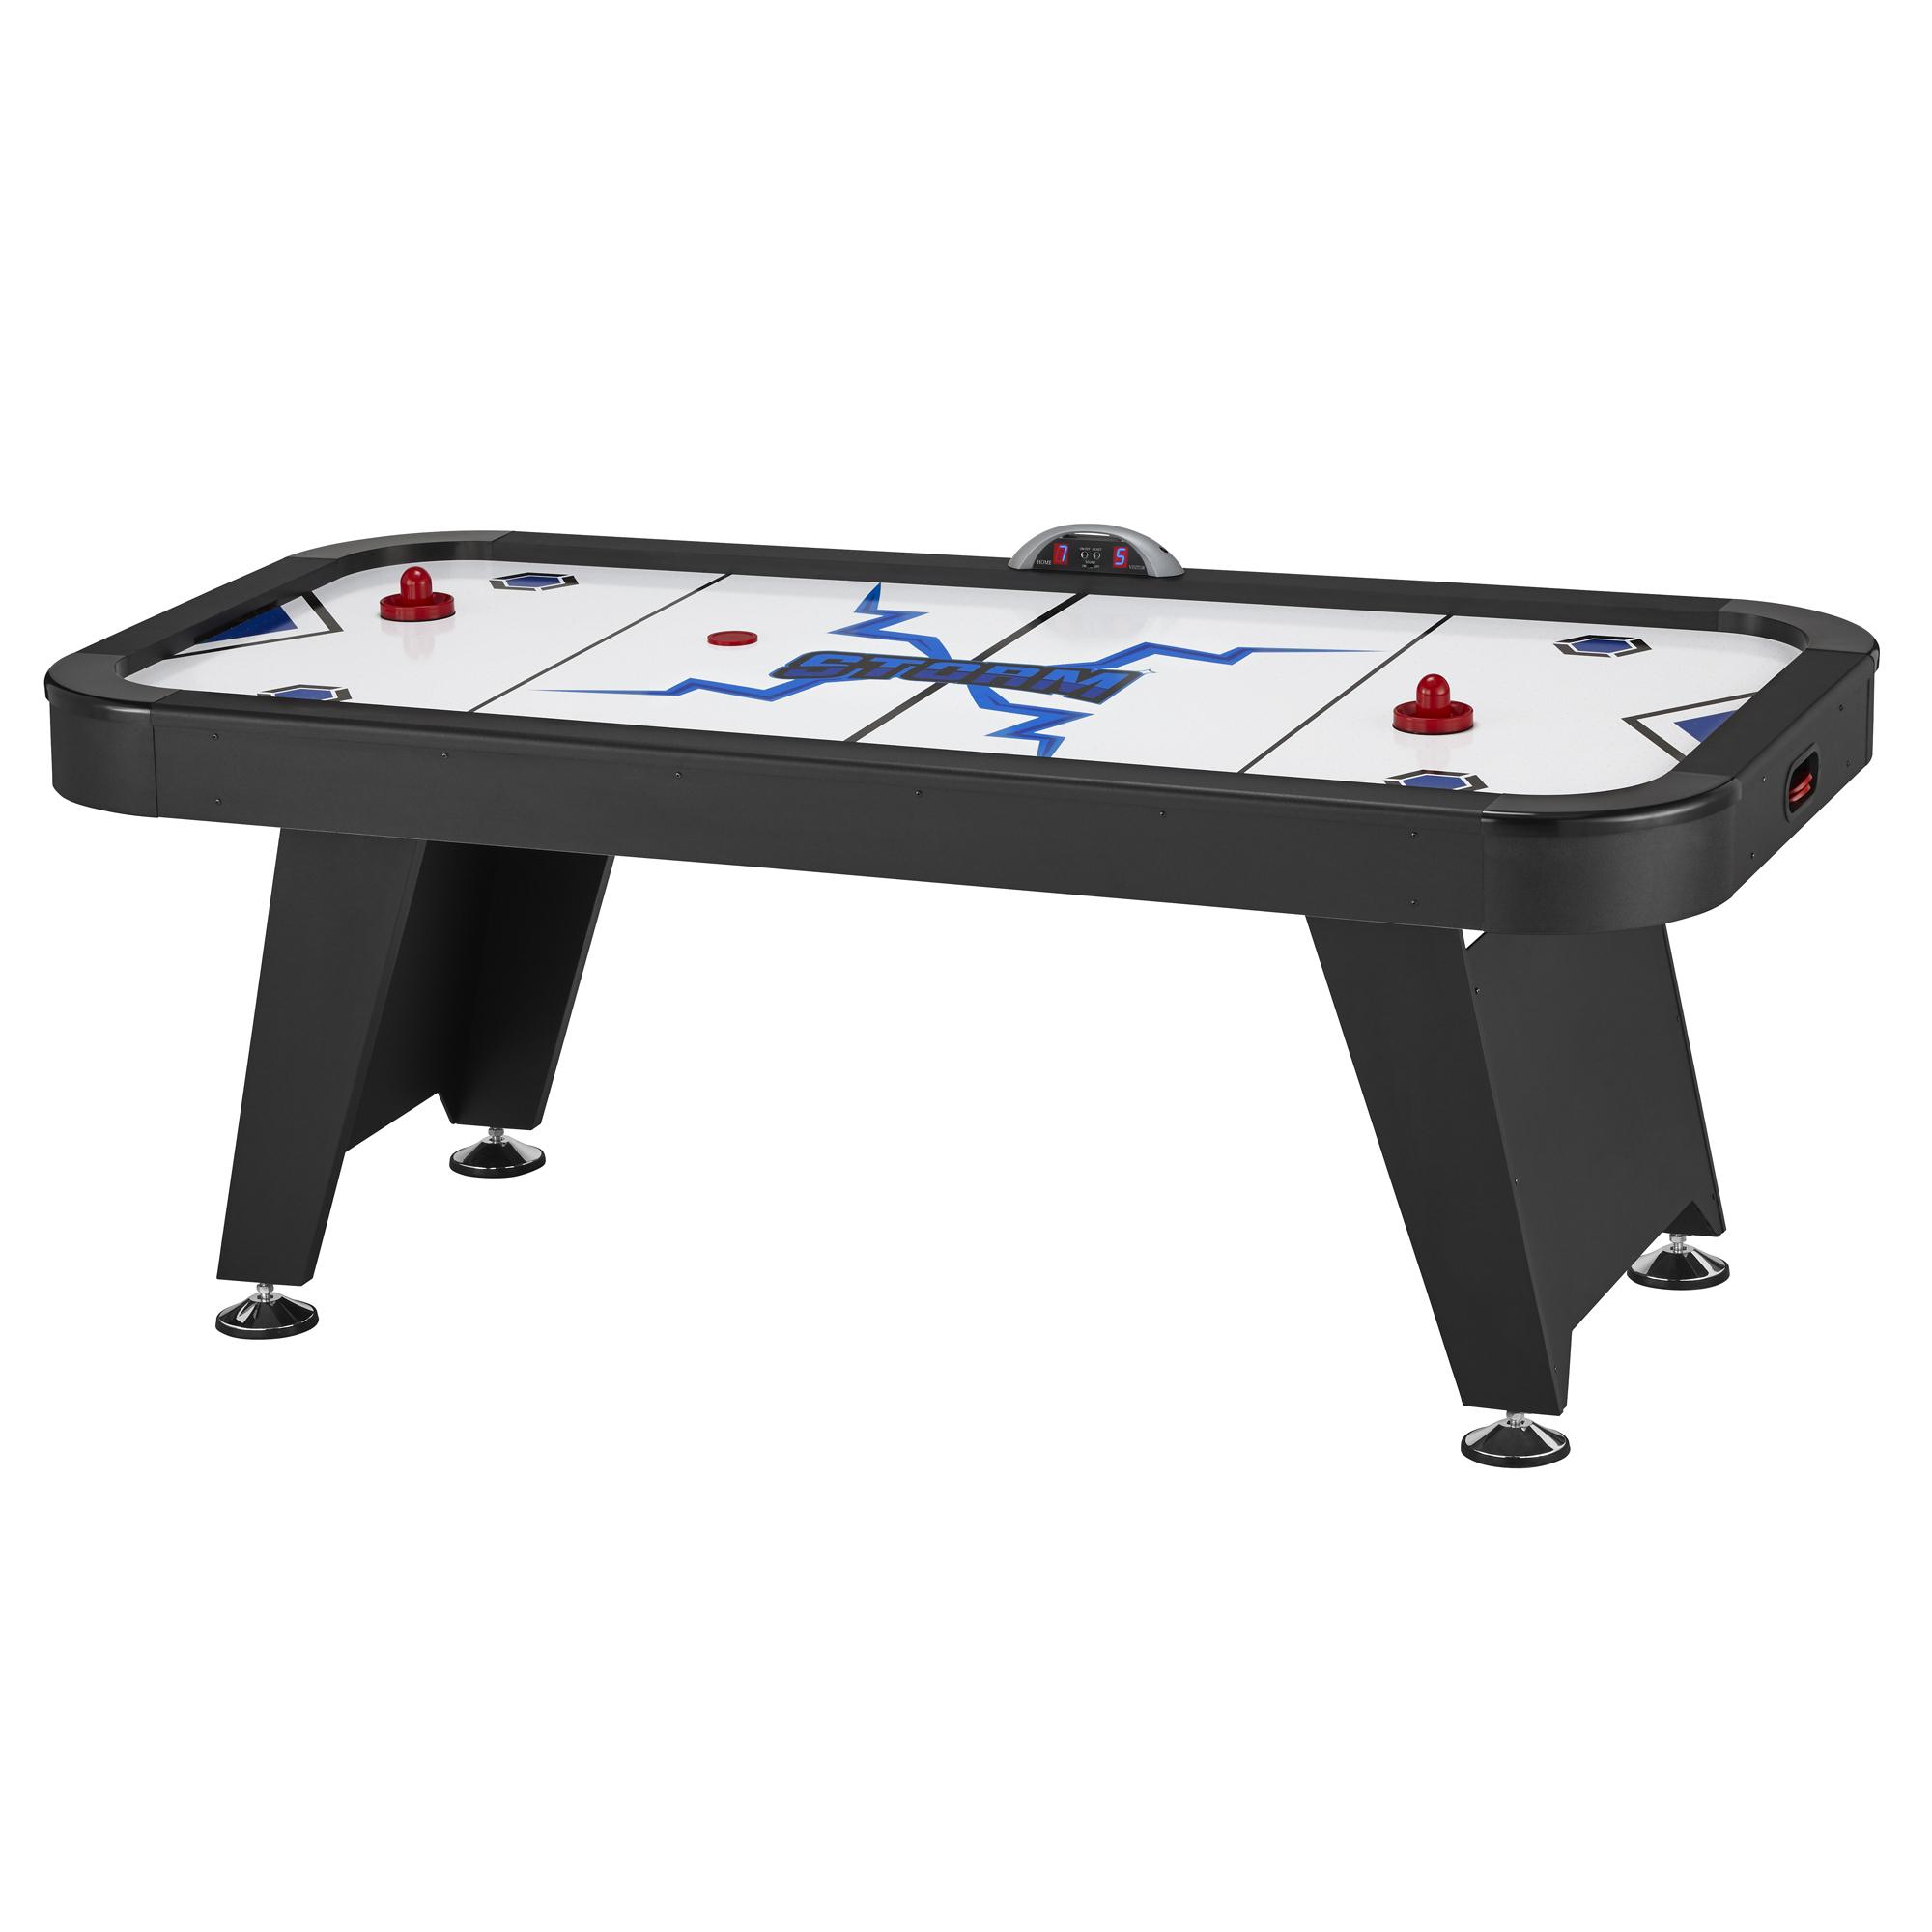 Fat Cat Storm MMXI Air Powered Hockey Table